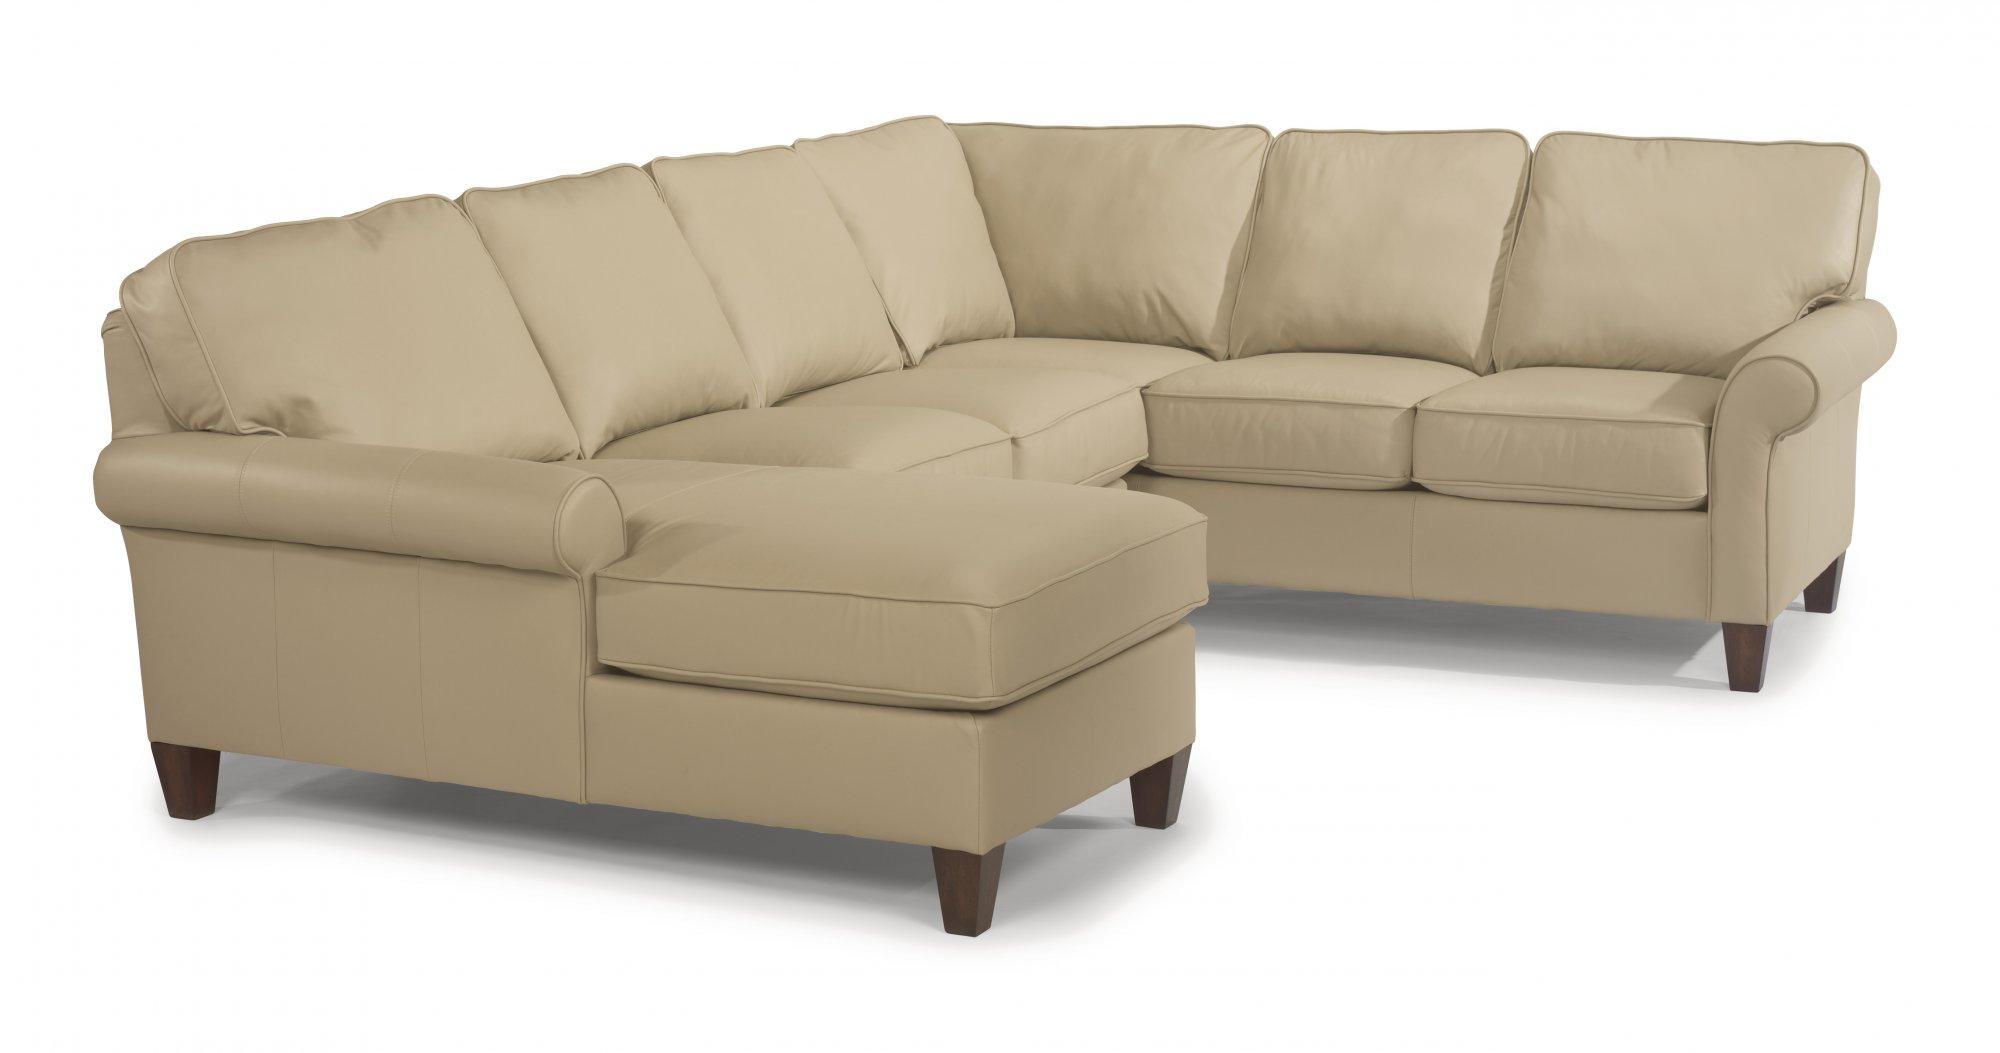 Miraculous Flexsteel 3979 Sect Westside Leather Sectional Craig Evergreenethics Interior Chair Design Evergreenethicsorg